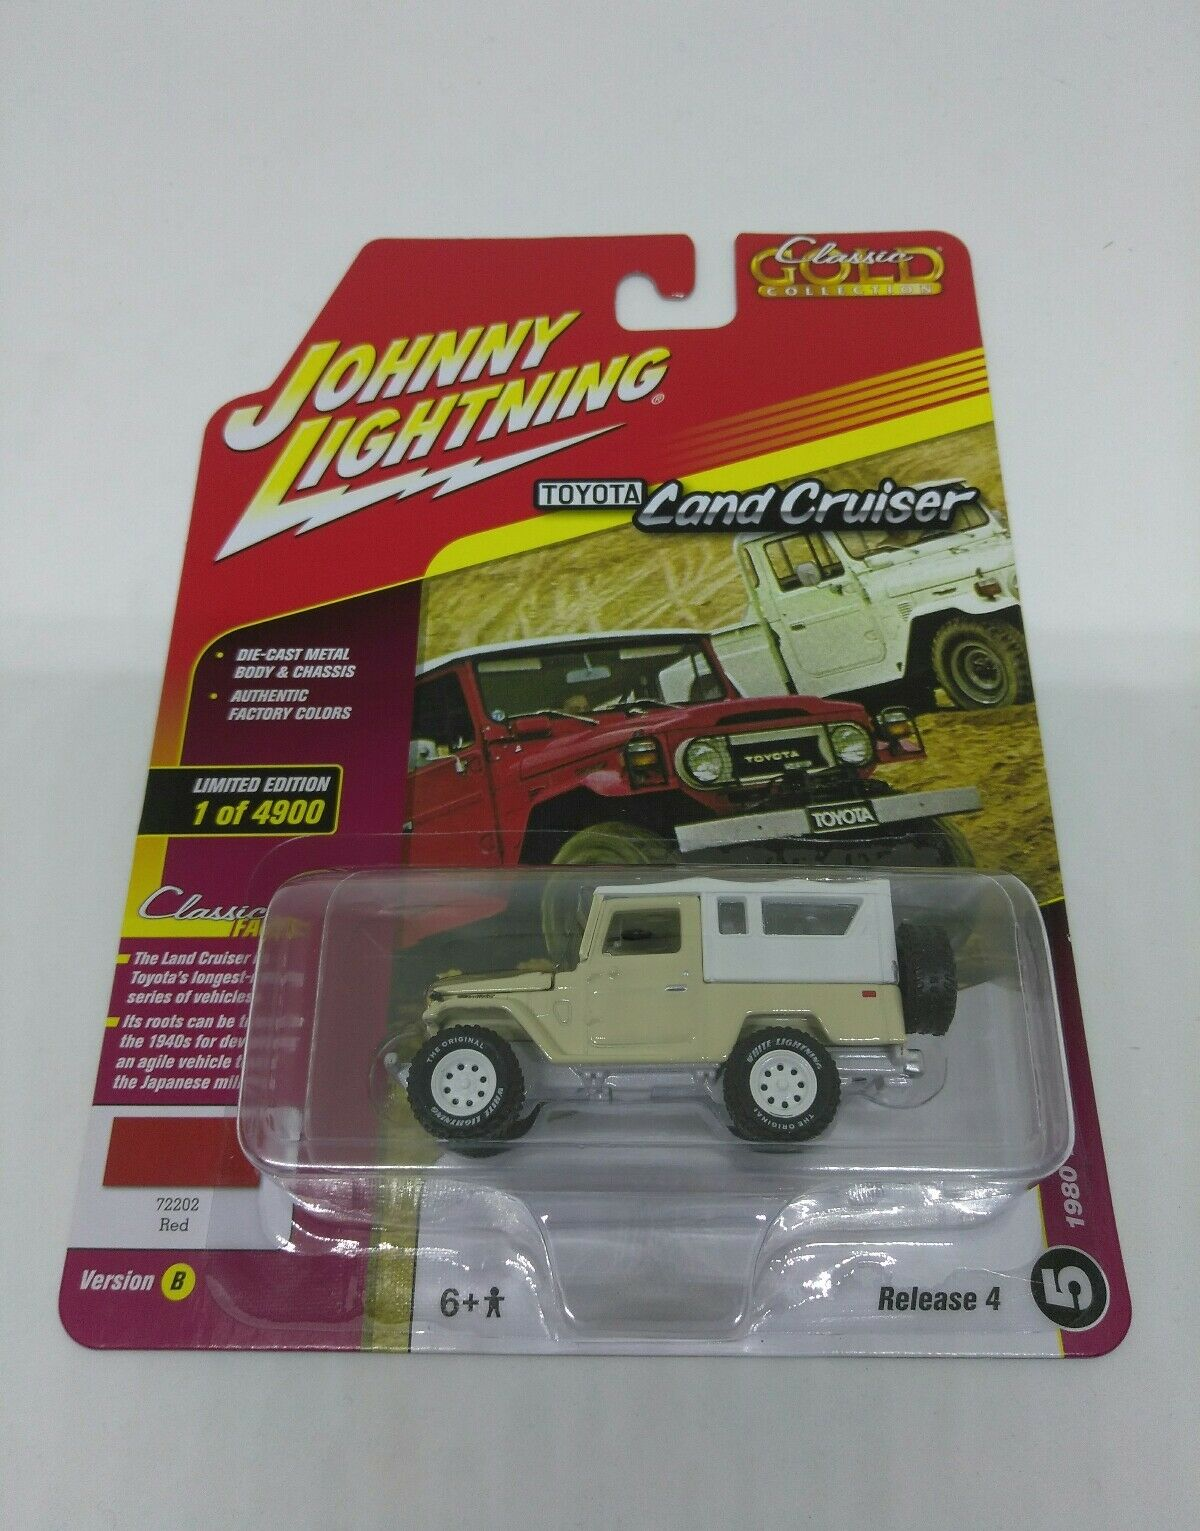 Extrêmement rare JL 1980 TOYOTA LAND CRUISER blanc Lightning CLASSICS or 1OF 100